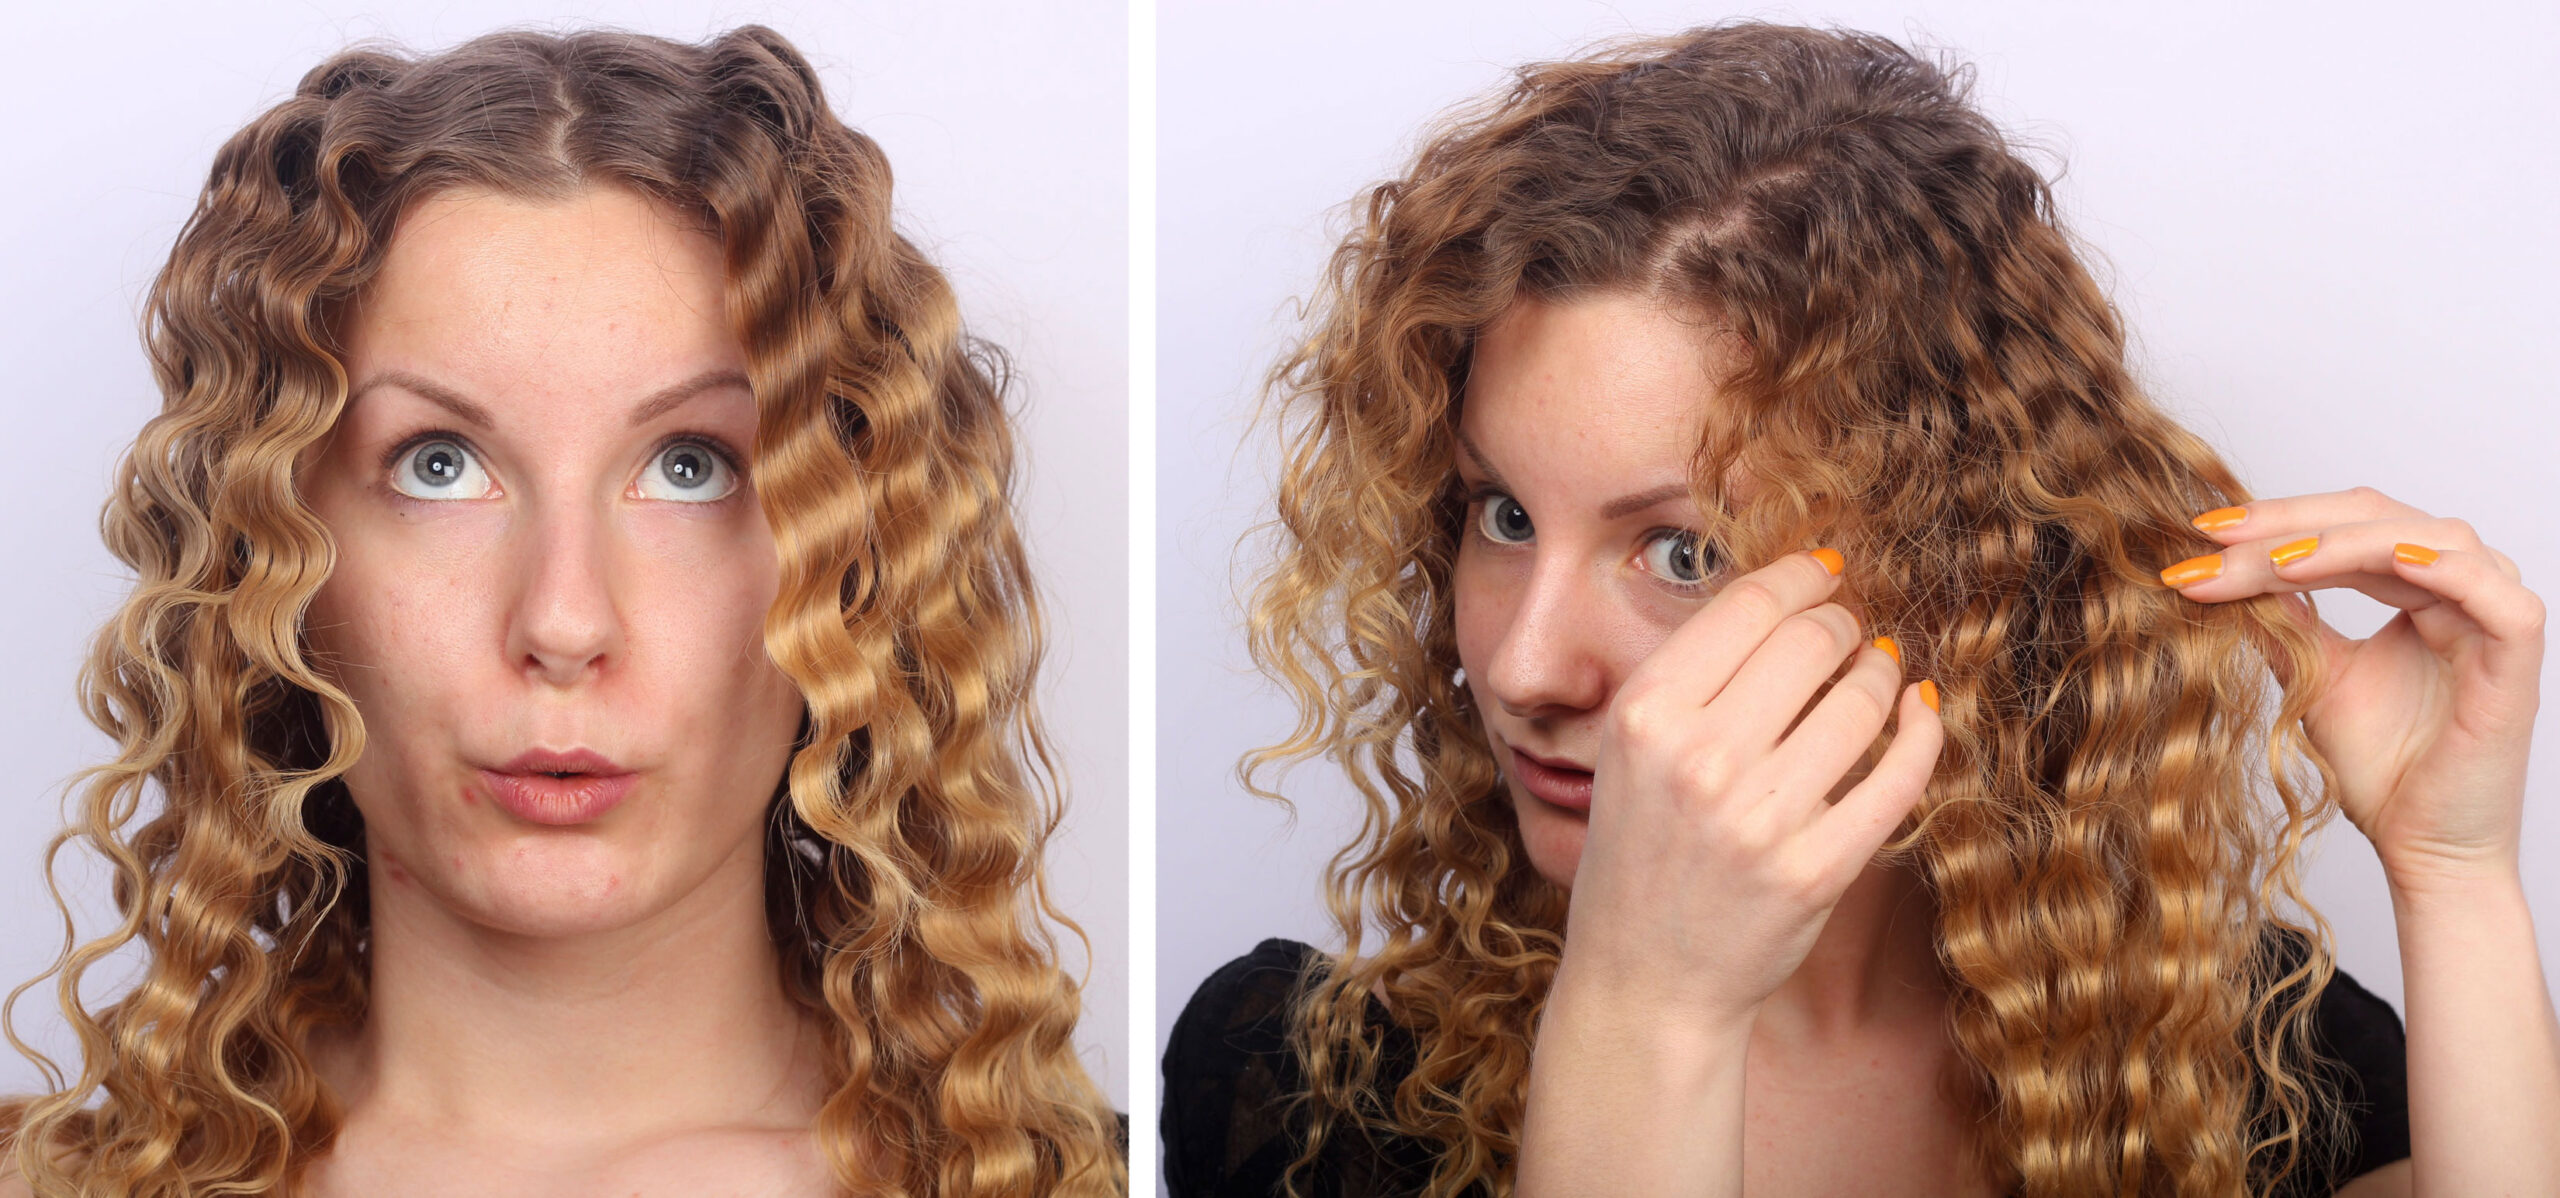 permanenta håret själv